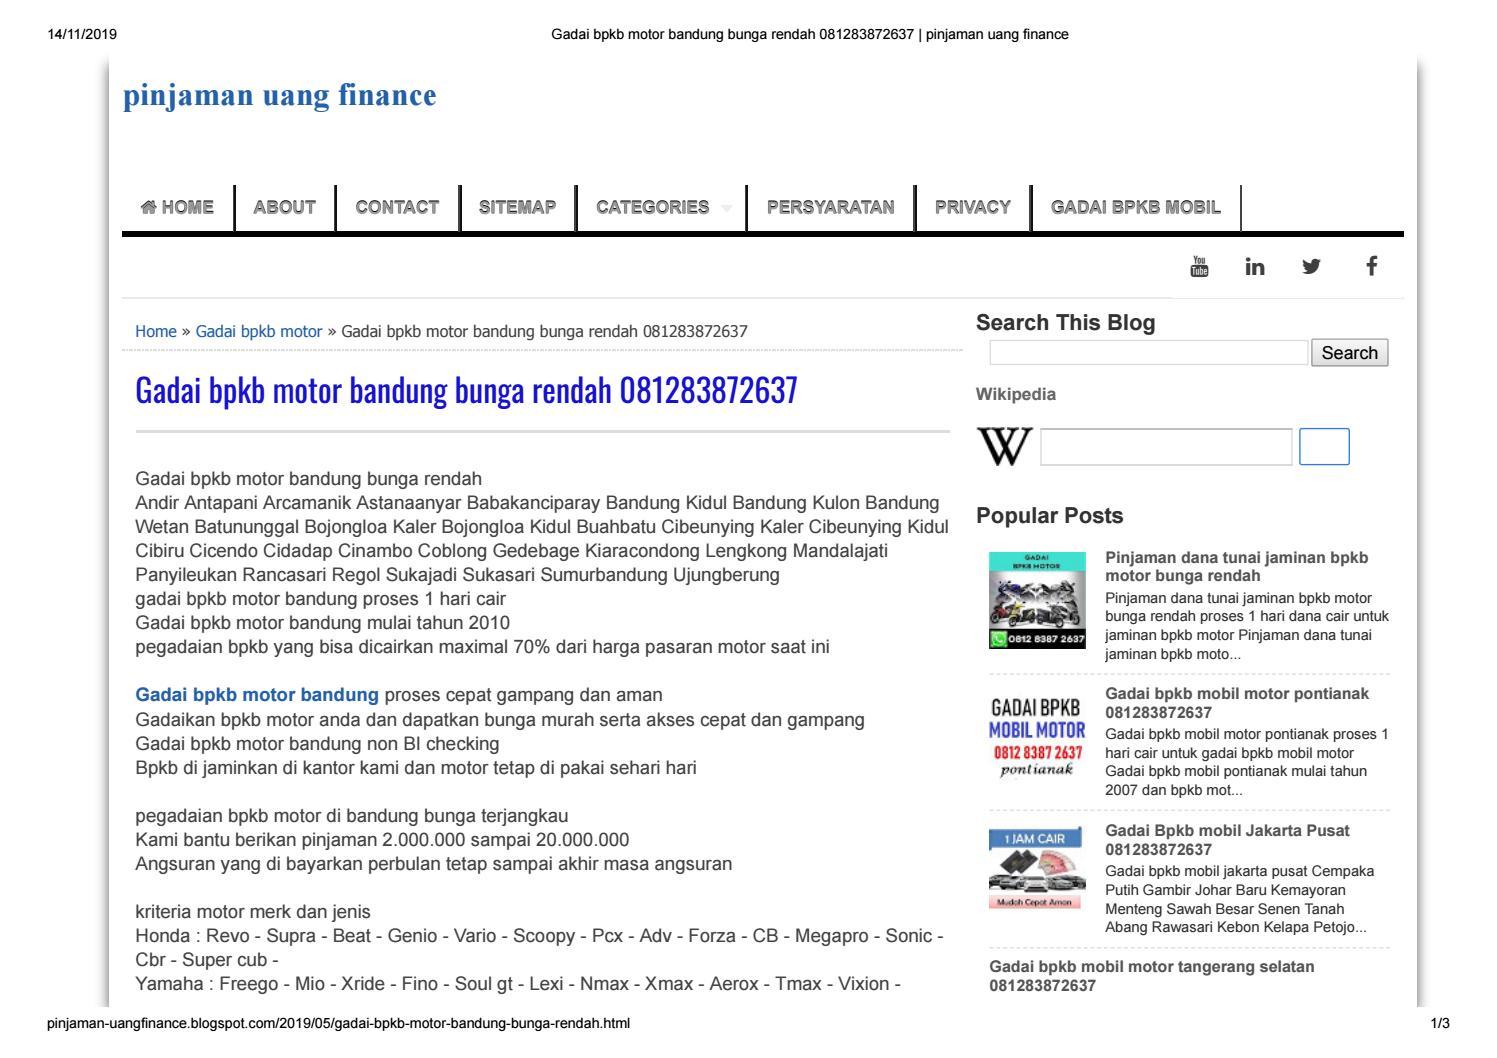 Gadai bpkb motor bandung 081283872637 by putrapinjaman - Issuu